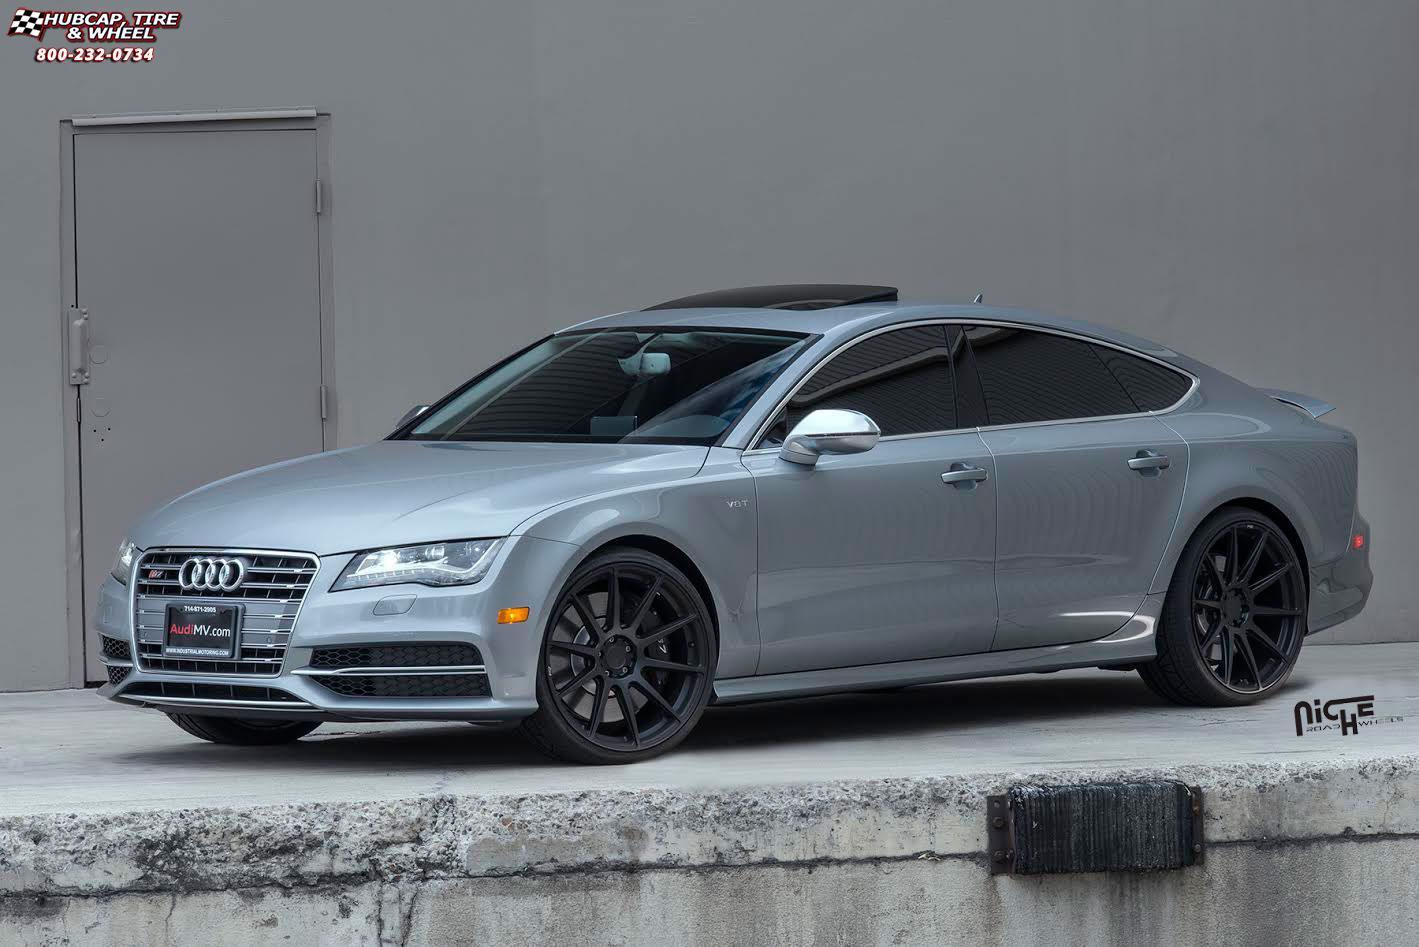 Audi S7 Niche Essen - M147 Wheels Matte Black Audi S Black on audi a7 black, cadillac brougham black, audi q5 black, audi b5 black, rolls-royce phantom coupe black, mercedes slk black, audi s6 black, audi a4 black, audi r4 black, audi b7 black, audi s6 coupe, subaru tribeca black, audi r8, mercedes-benz g63 black, audi s8 black, audi a5, audi s5 black, audi c5 black, audi rs7, audi q8 black,